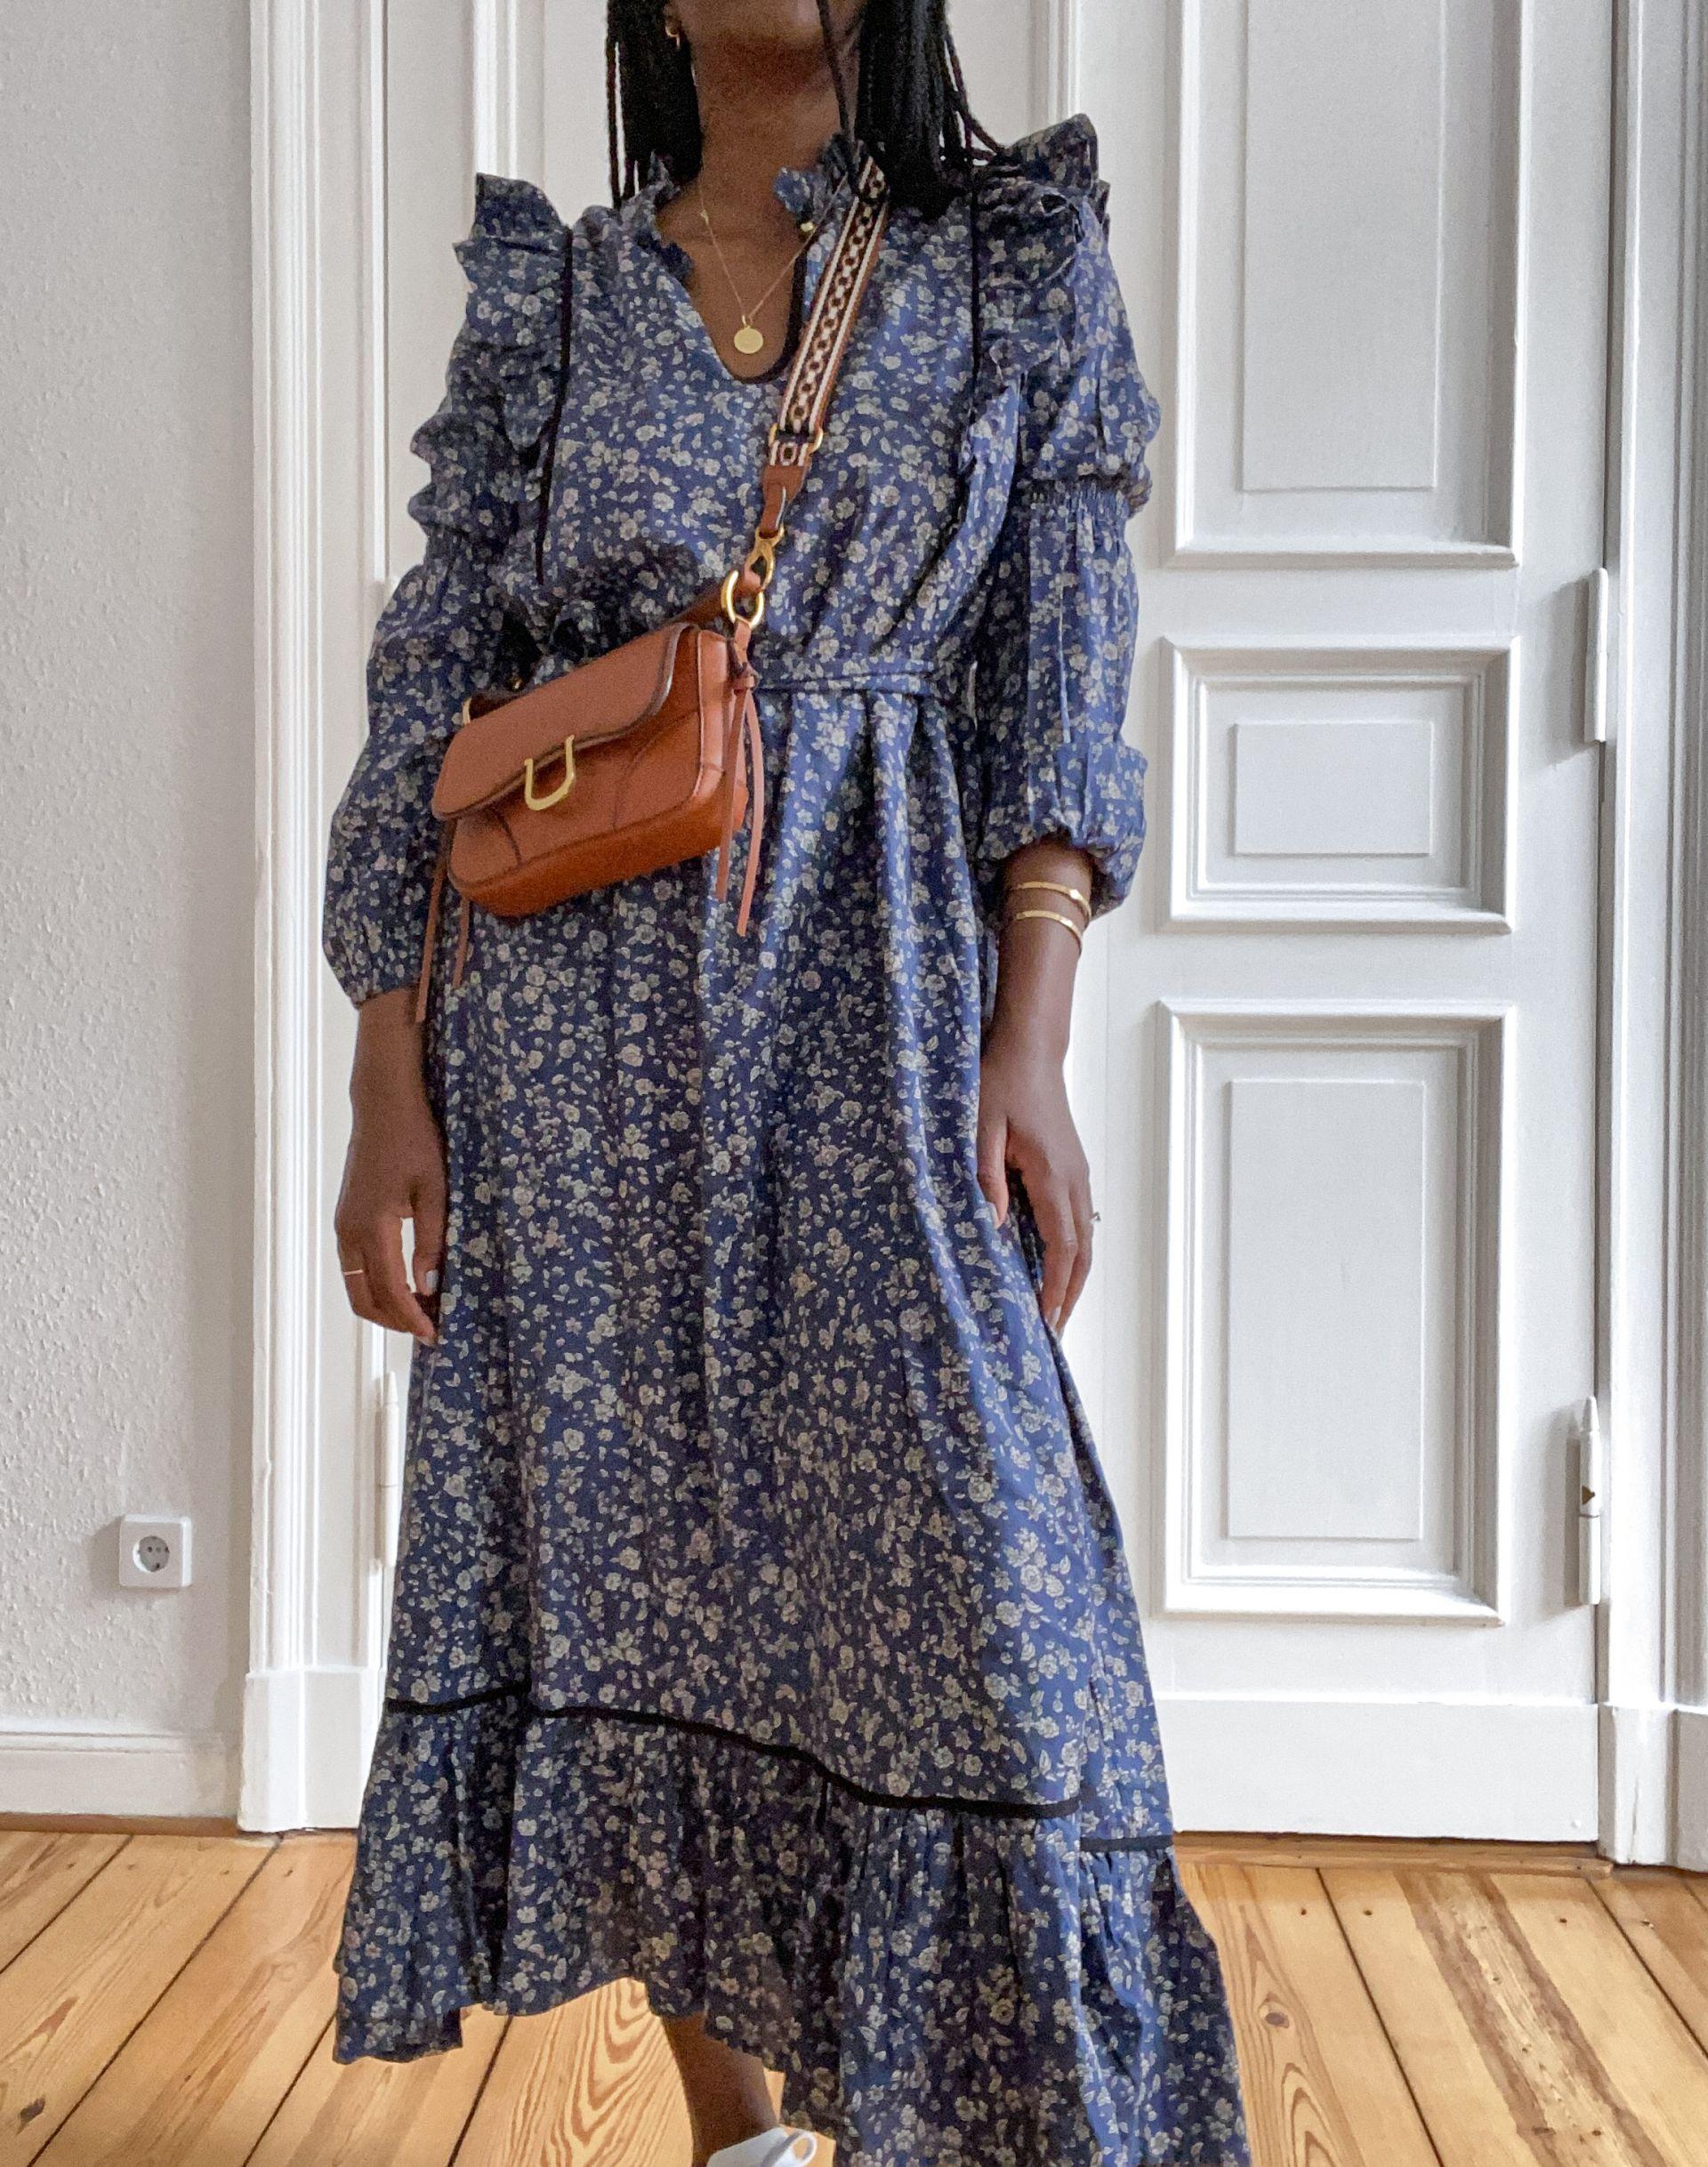 Spring Dresses Mango Bag Veja Sneaker deBijenkorf_5236